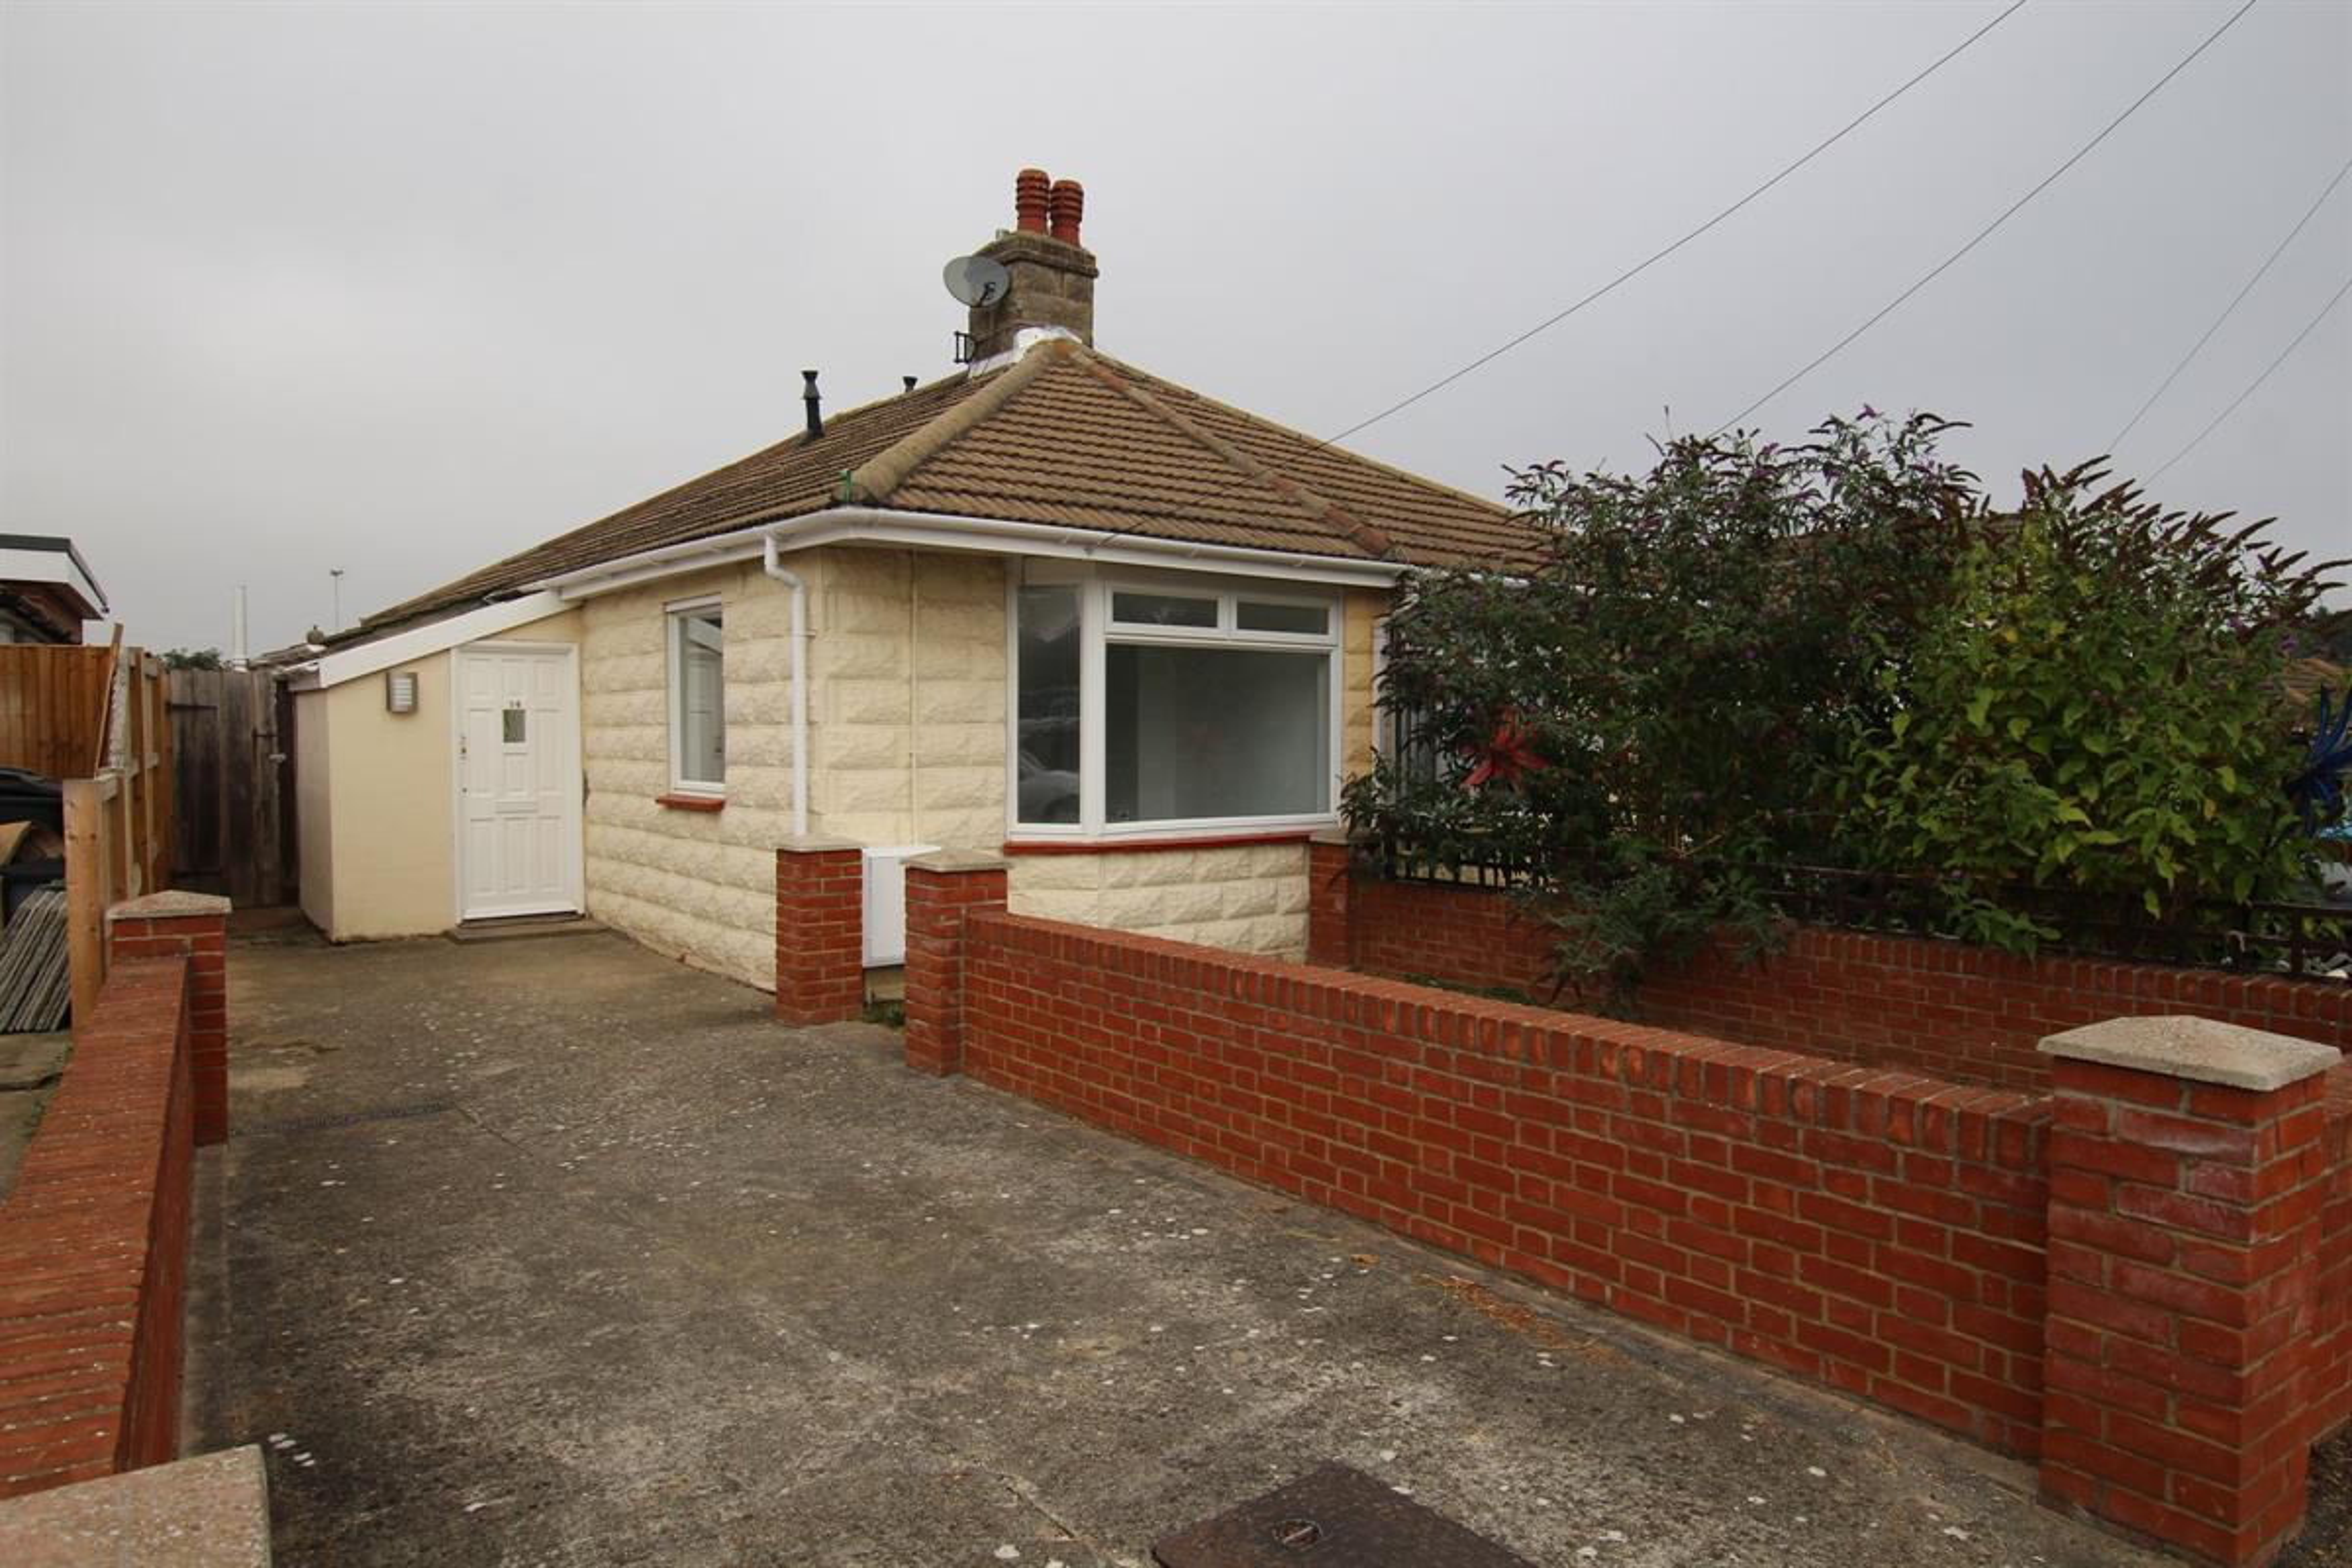 Craigfield Avenue, Clacton-on-Sea